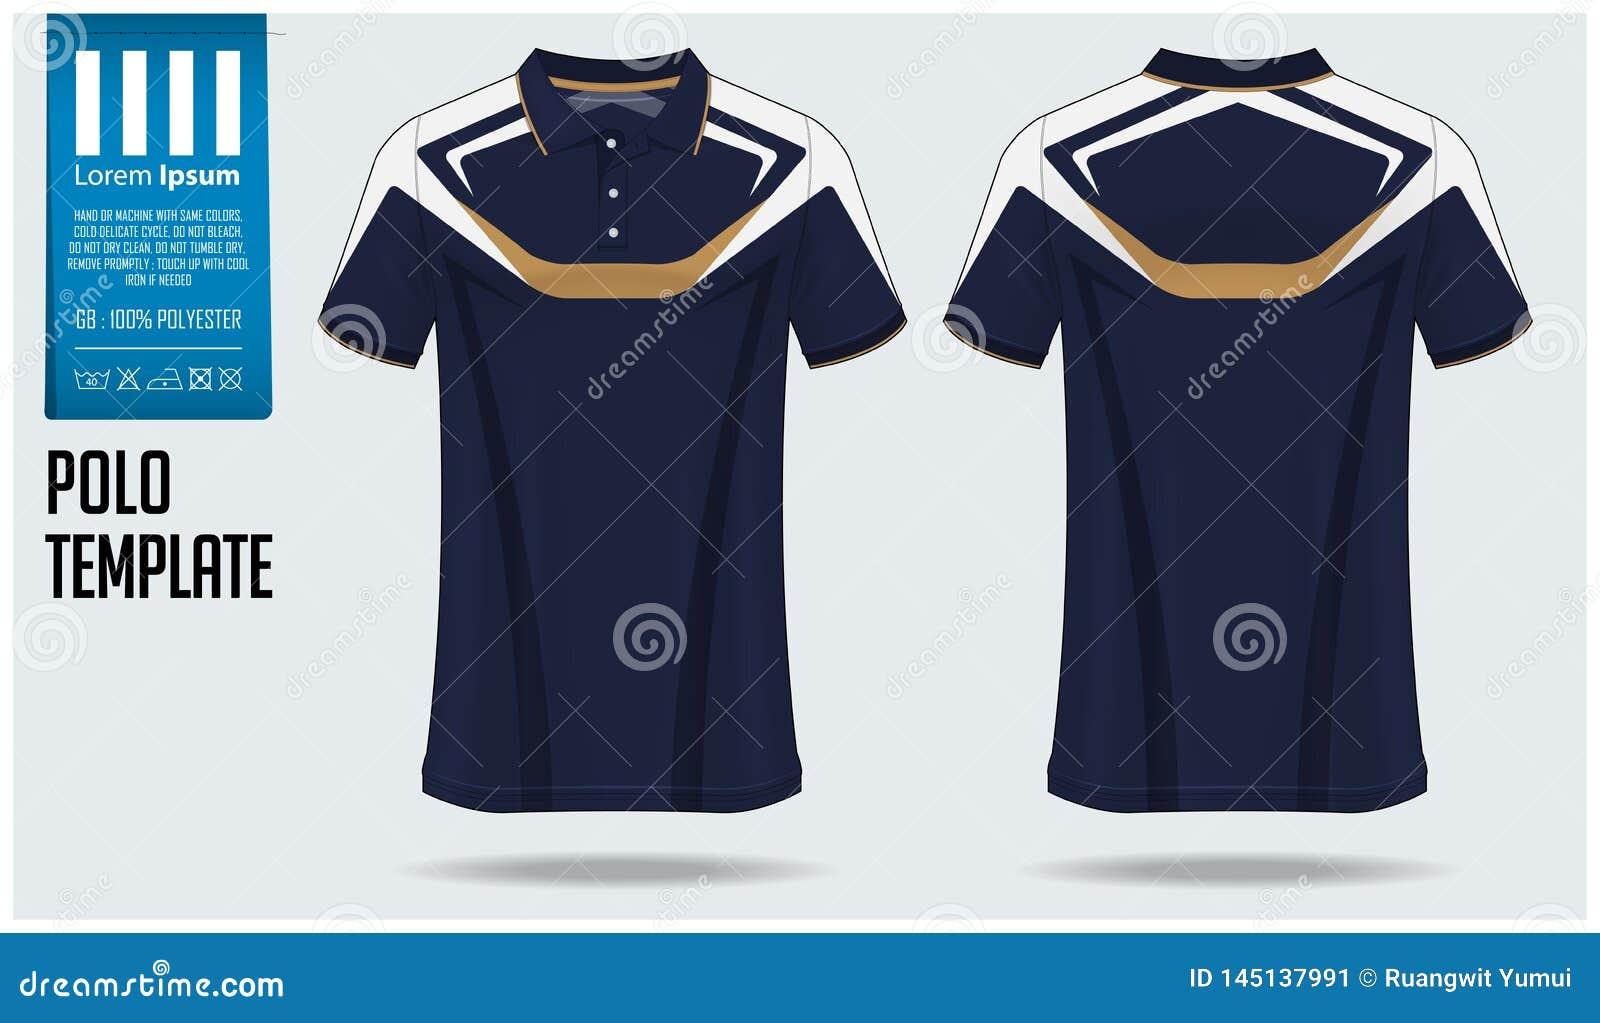 ca31e219d polo-t-shirt-mockup-template-design-soccer-jersey-football-kit-sportswear -polo-t-shirt-mockup-template-design-soccer-145137991.jpg